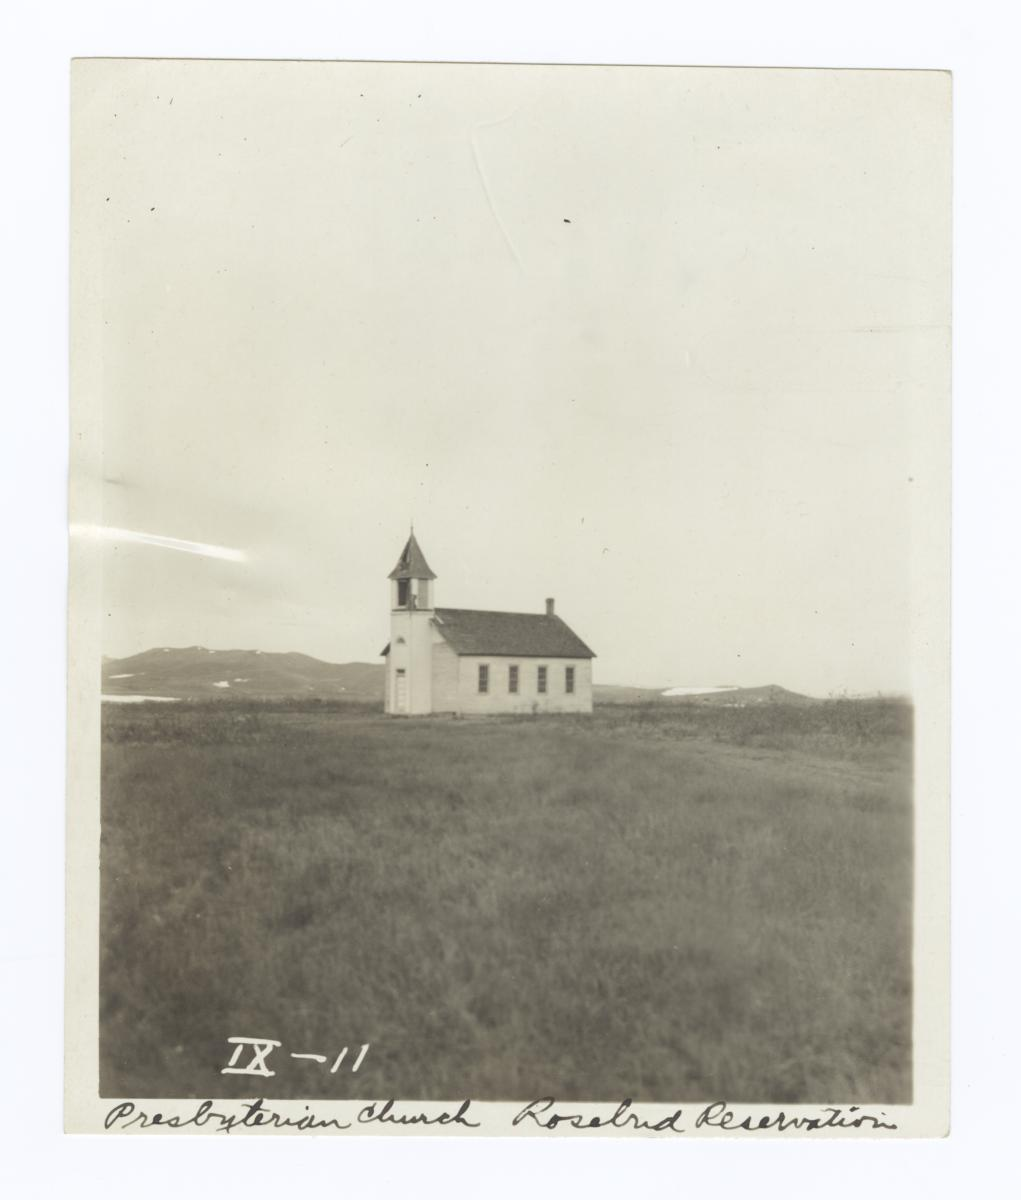 Presbyterian Church, Rosebud Reservation, South Dakota